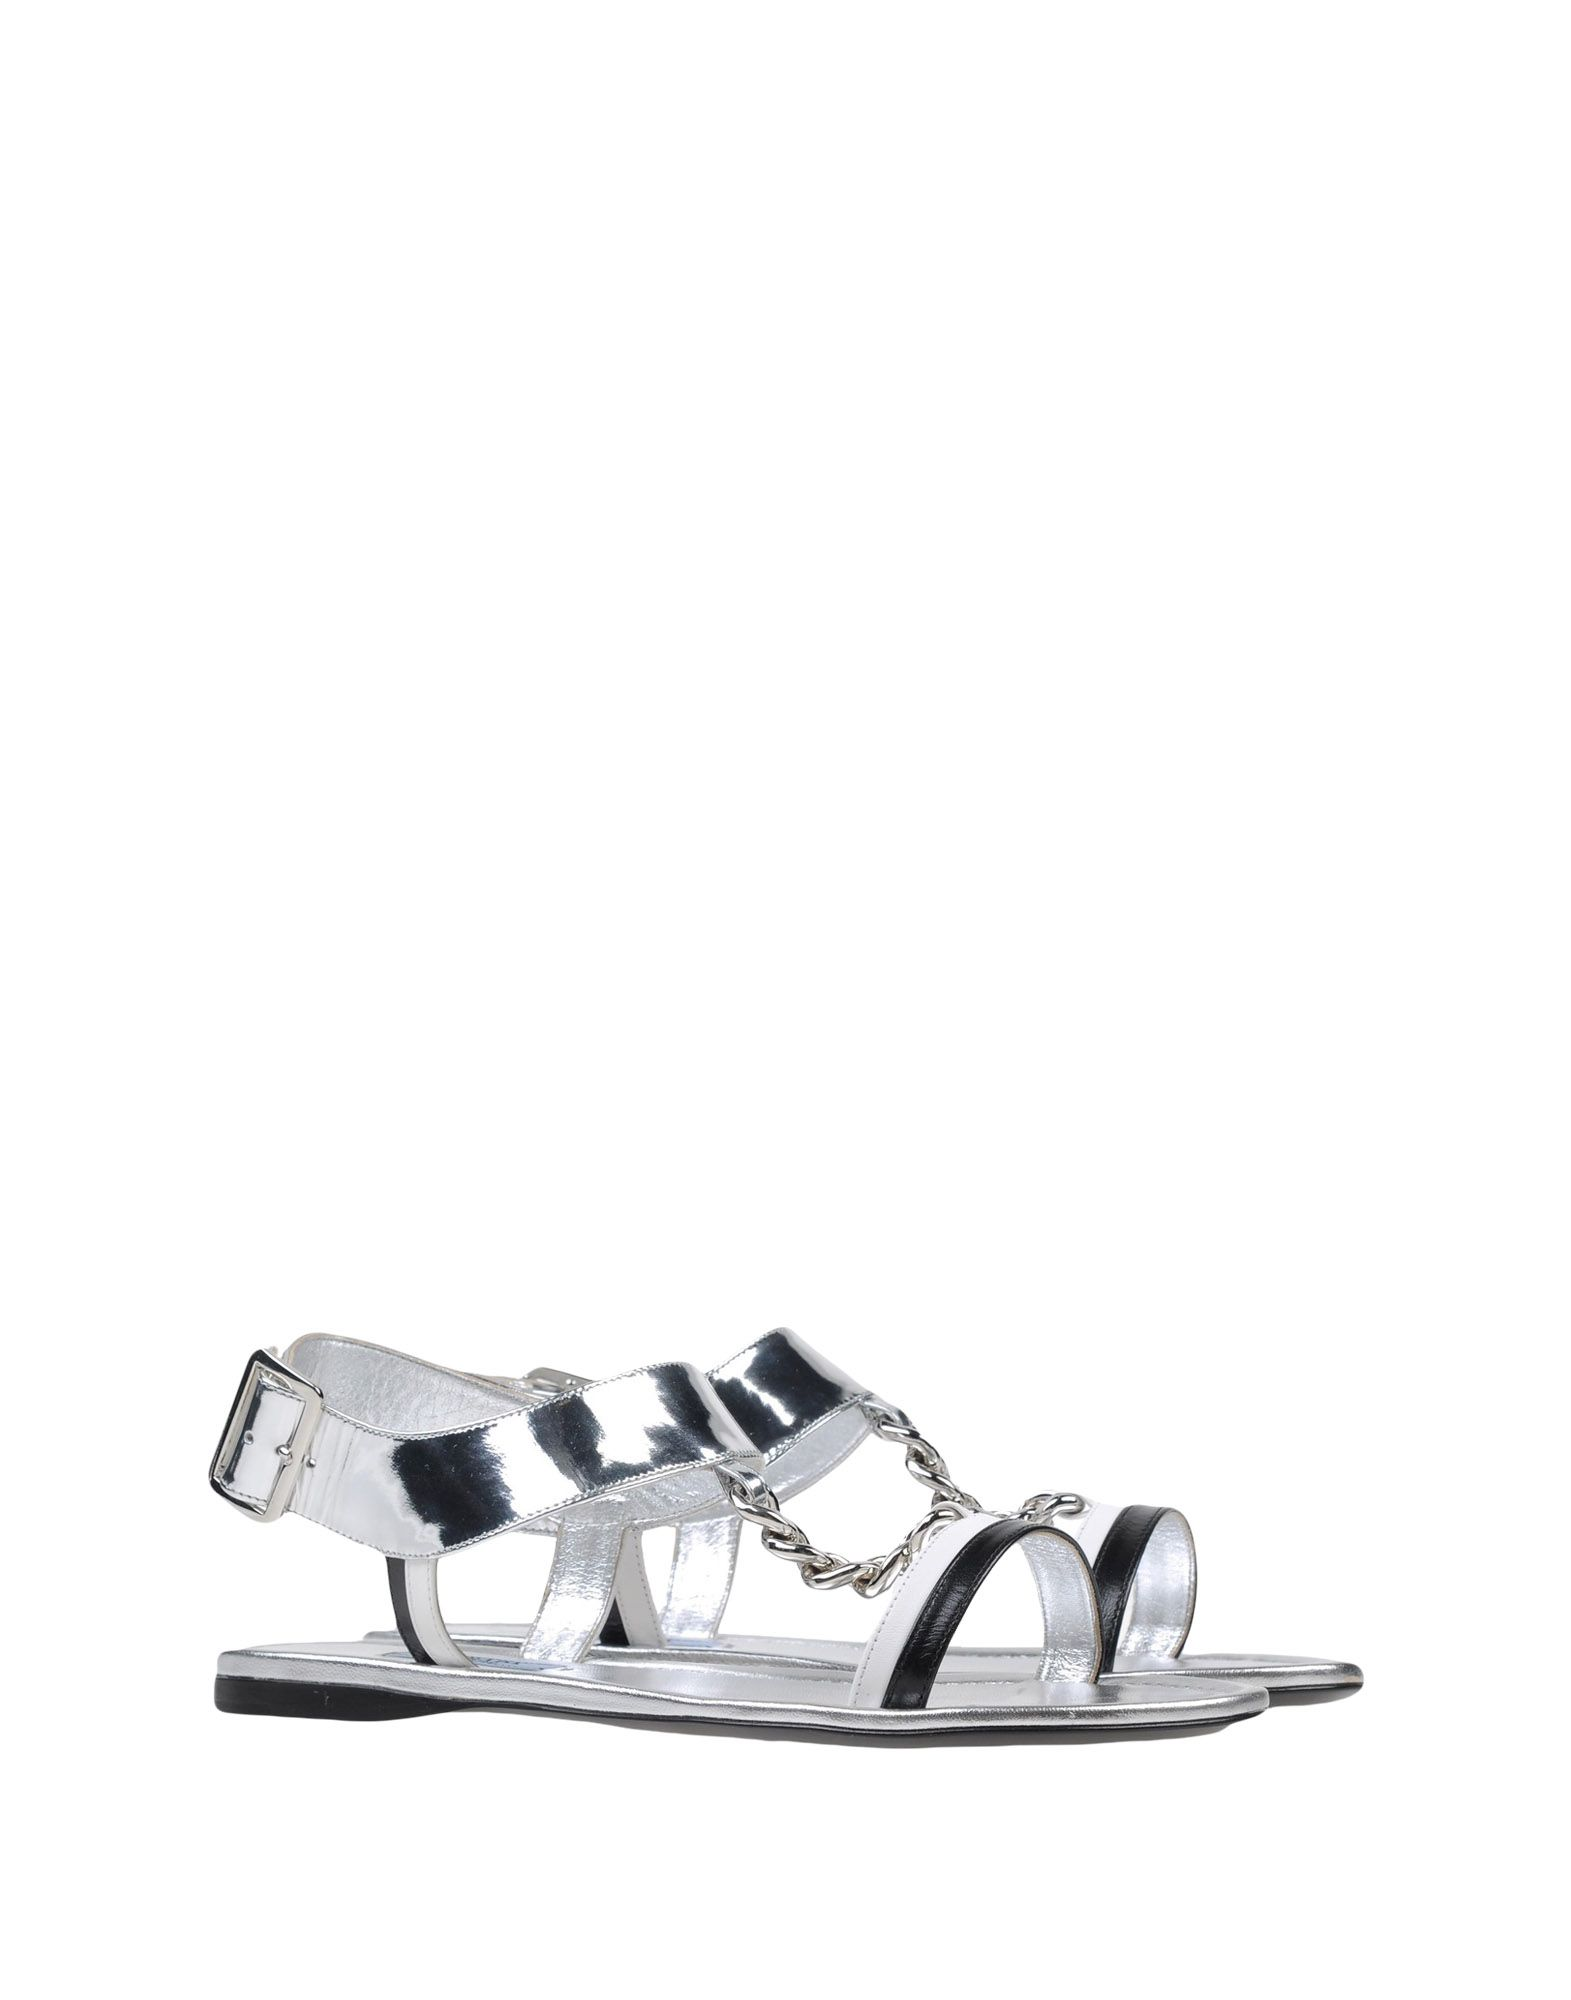 Prada gut Sandalen Damen  11132727EXGünstige gut Prada aussehende Schuhe d9c16c